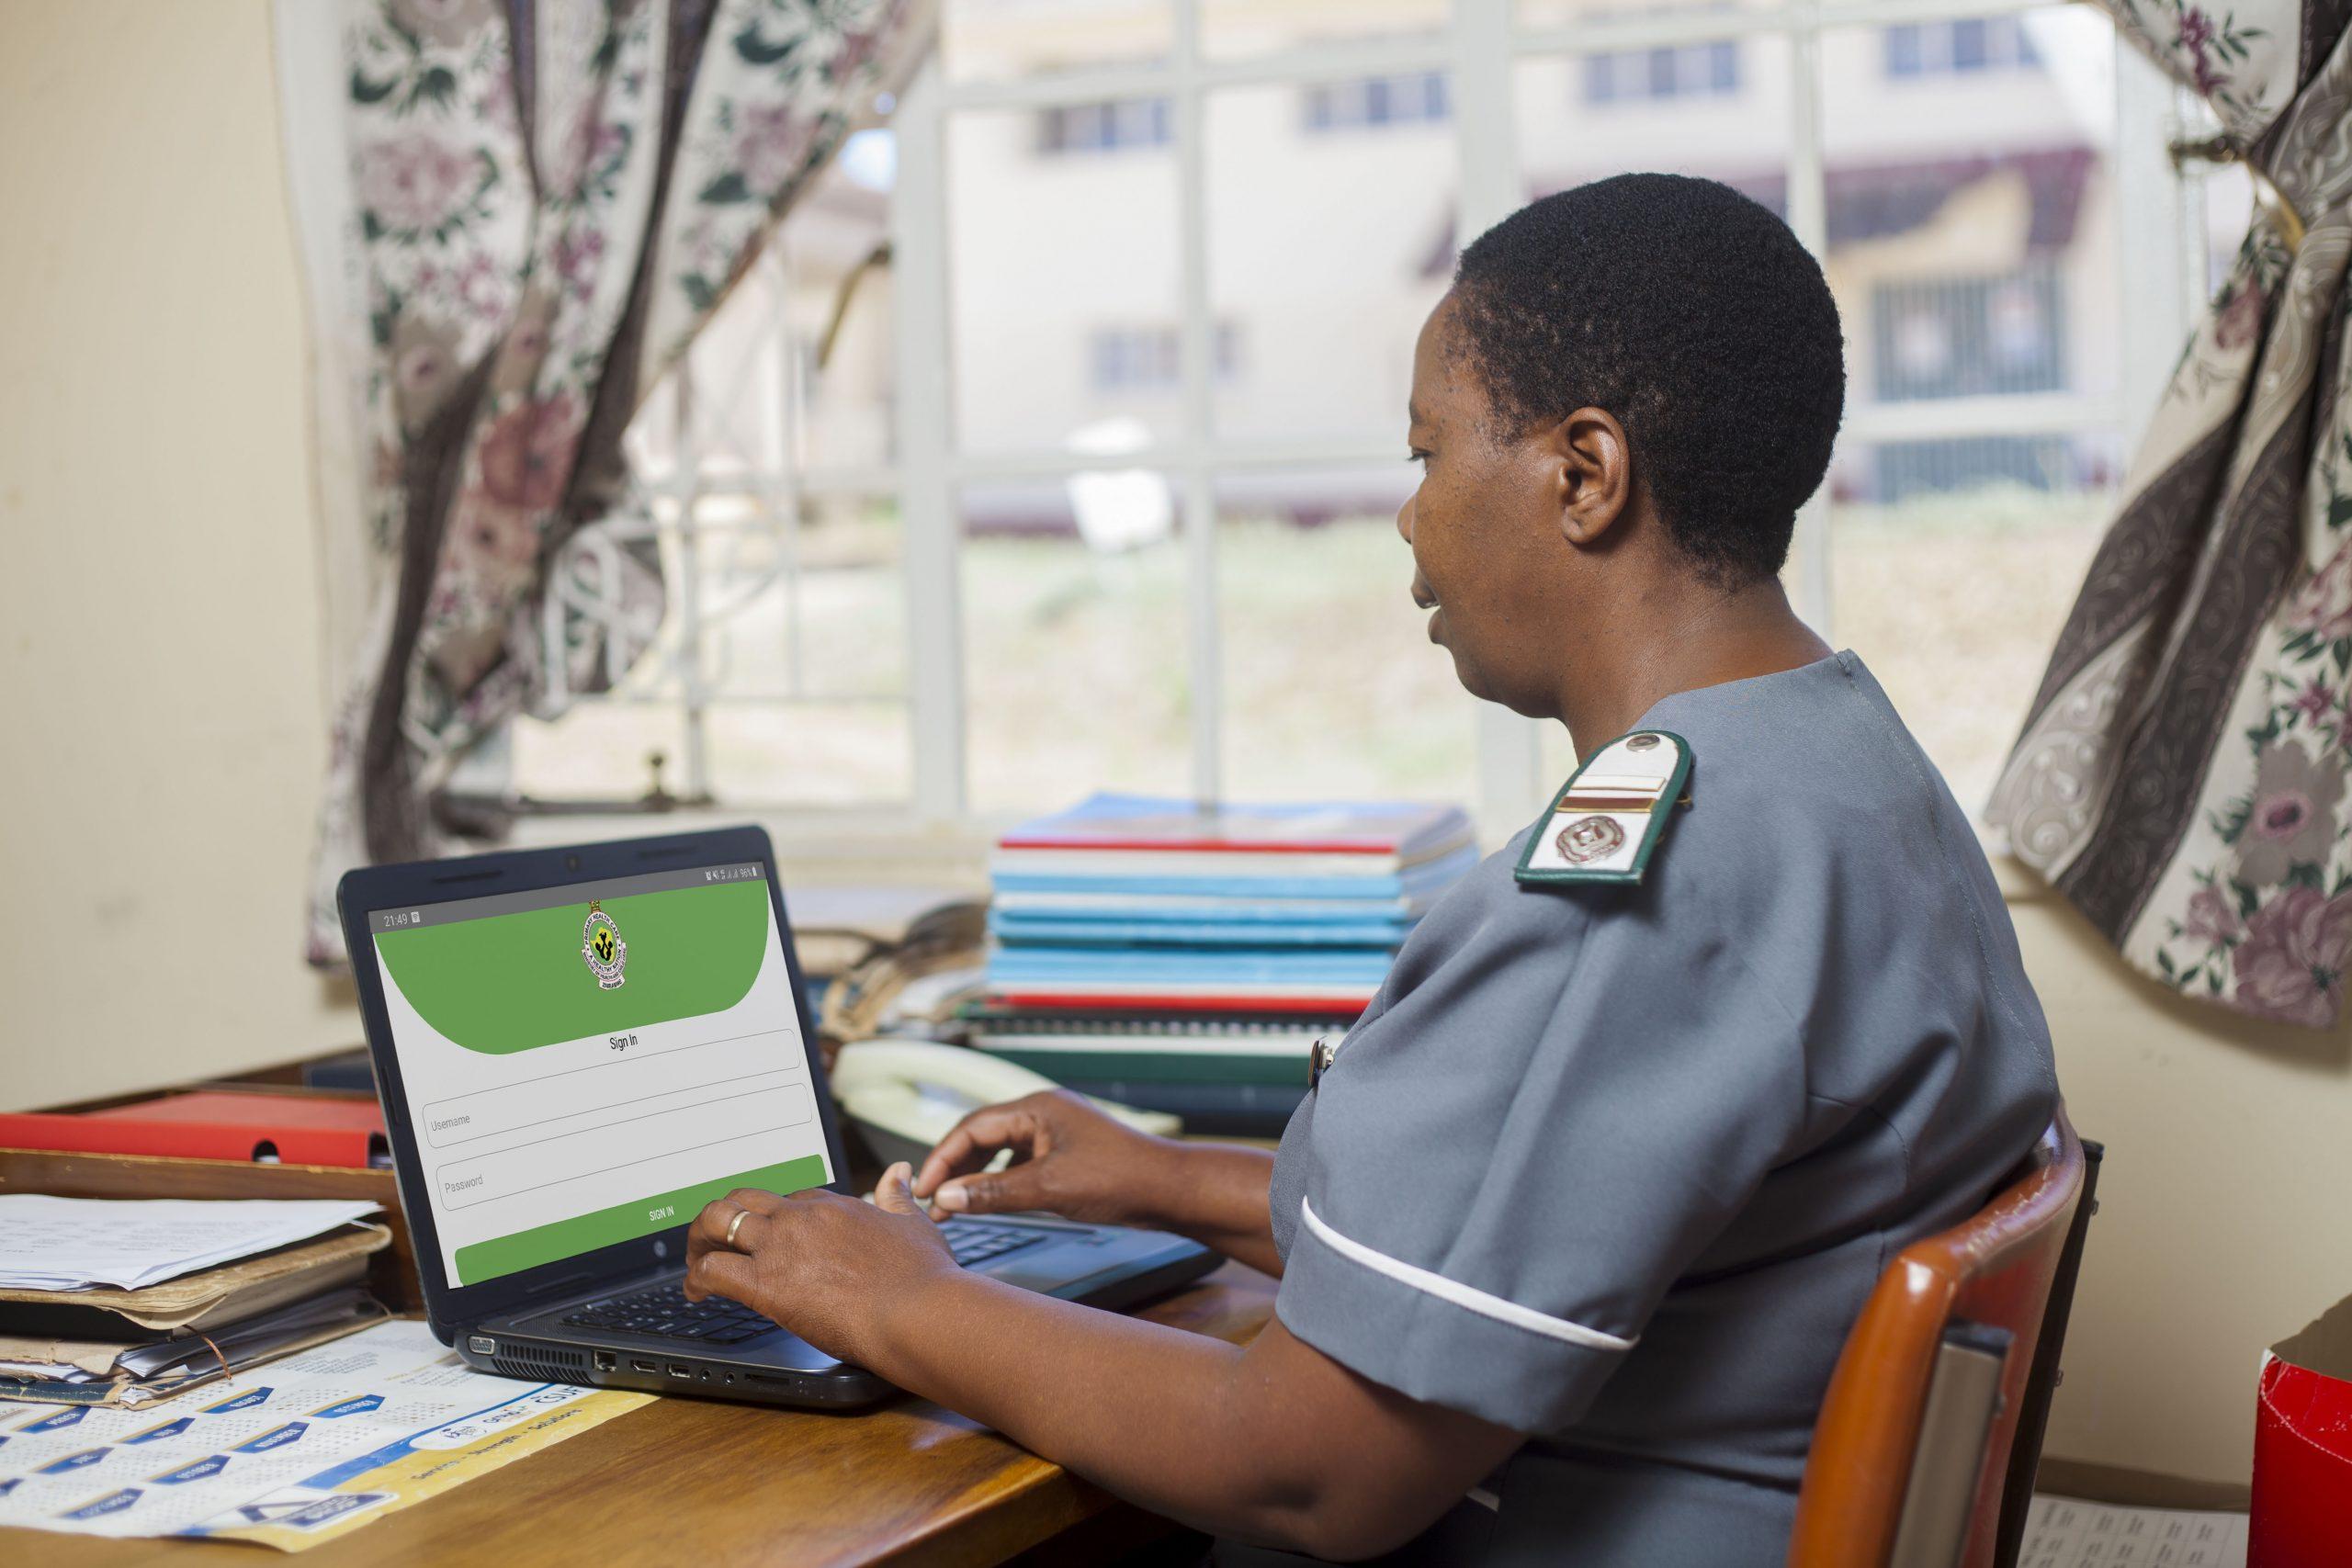 Celebrating with our Nurses on International Nurses Day